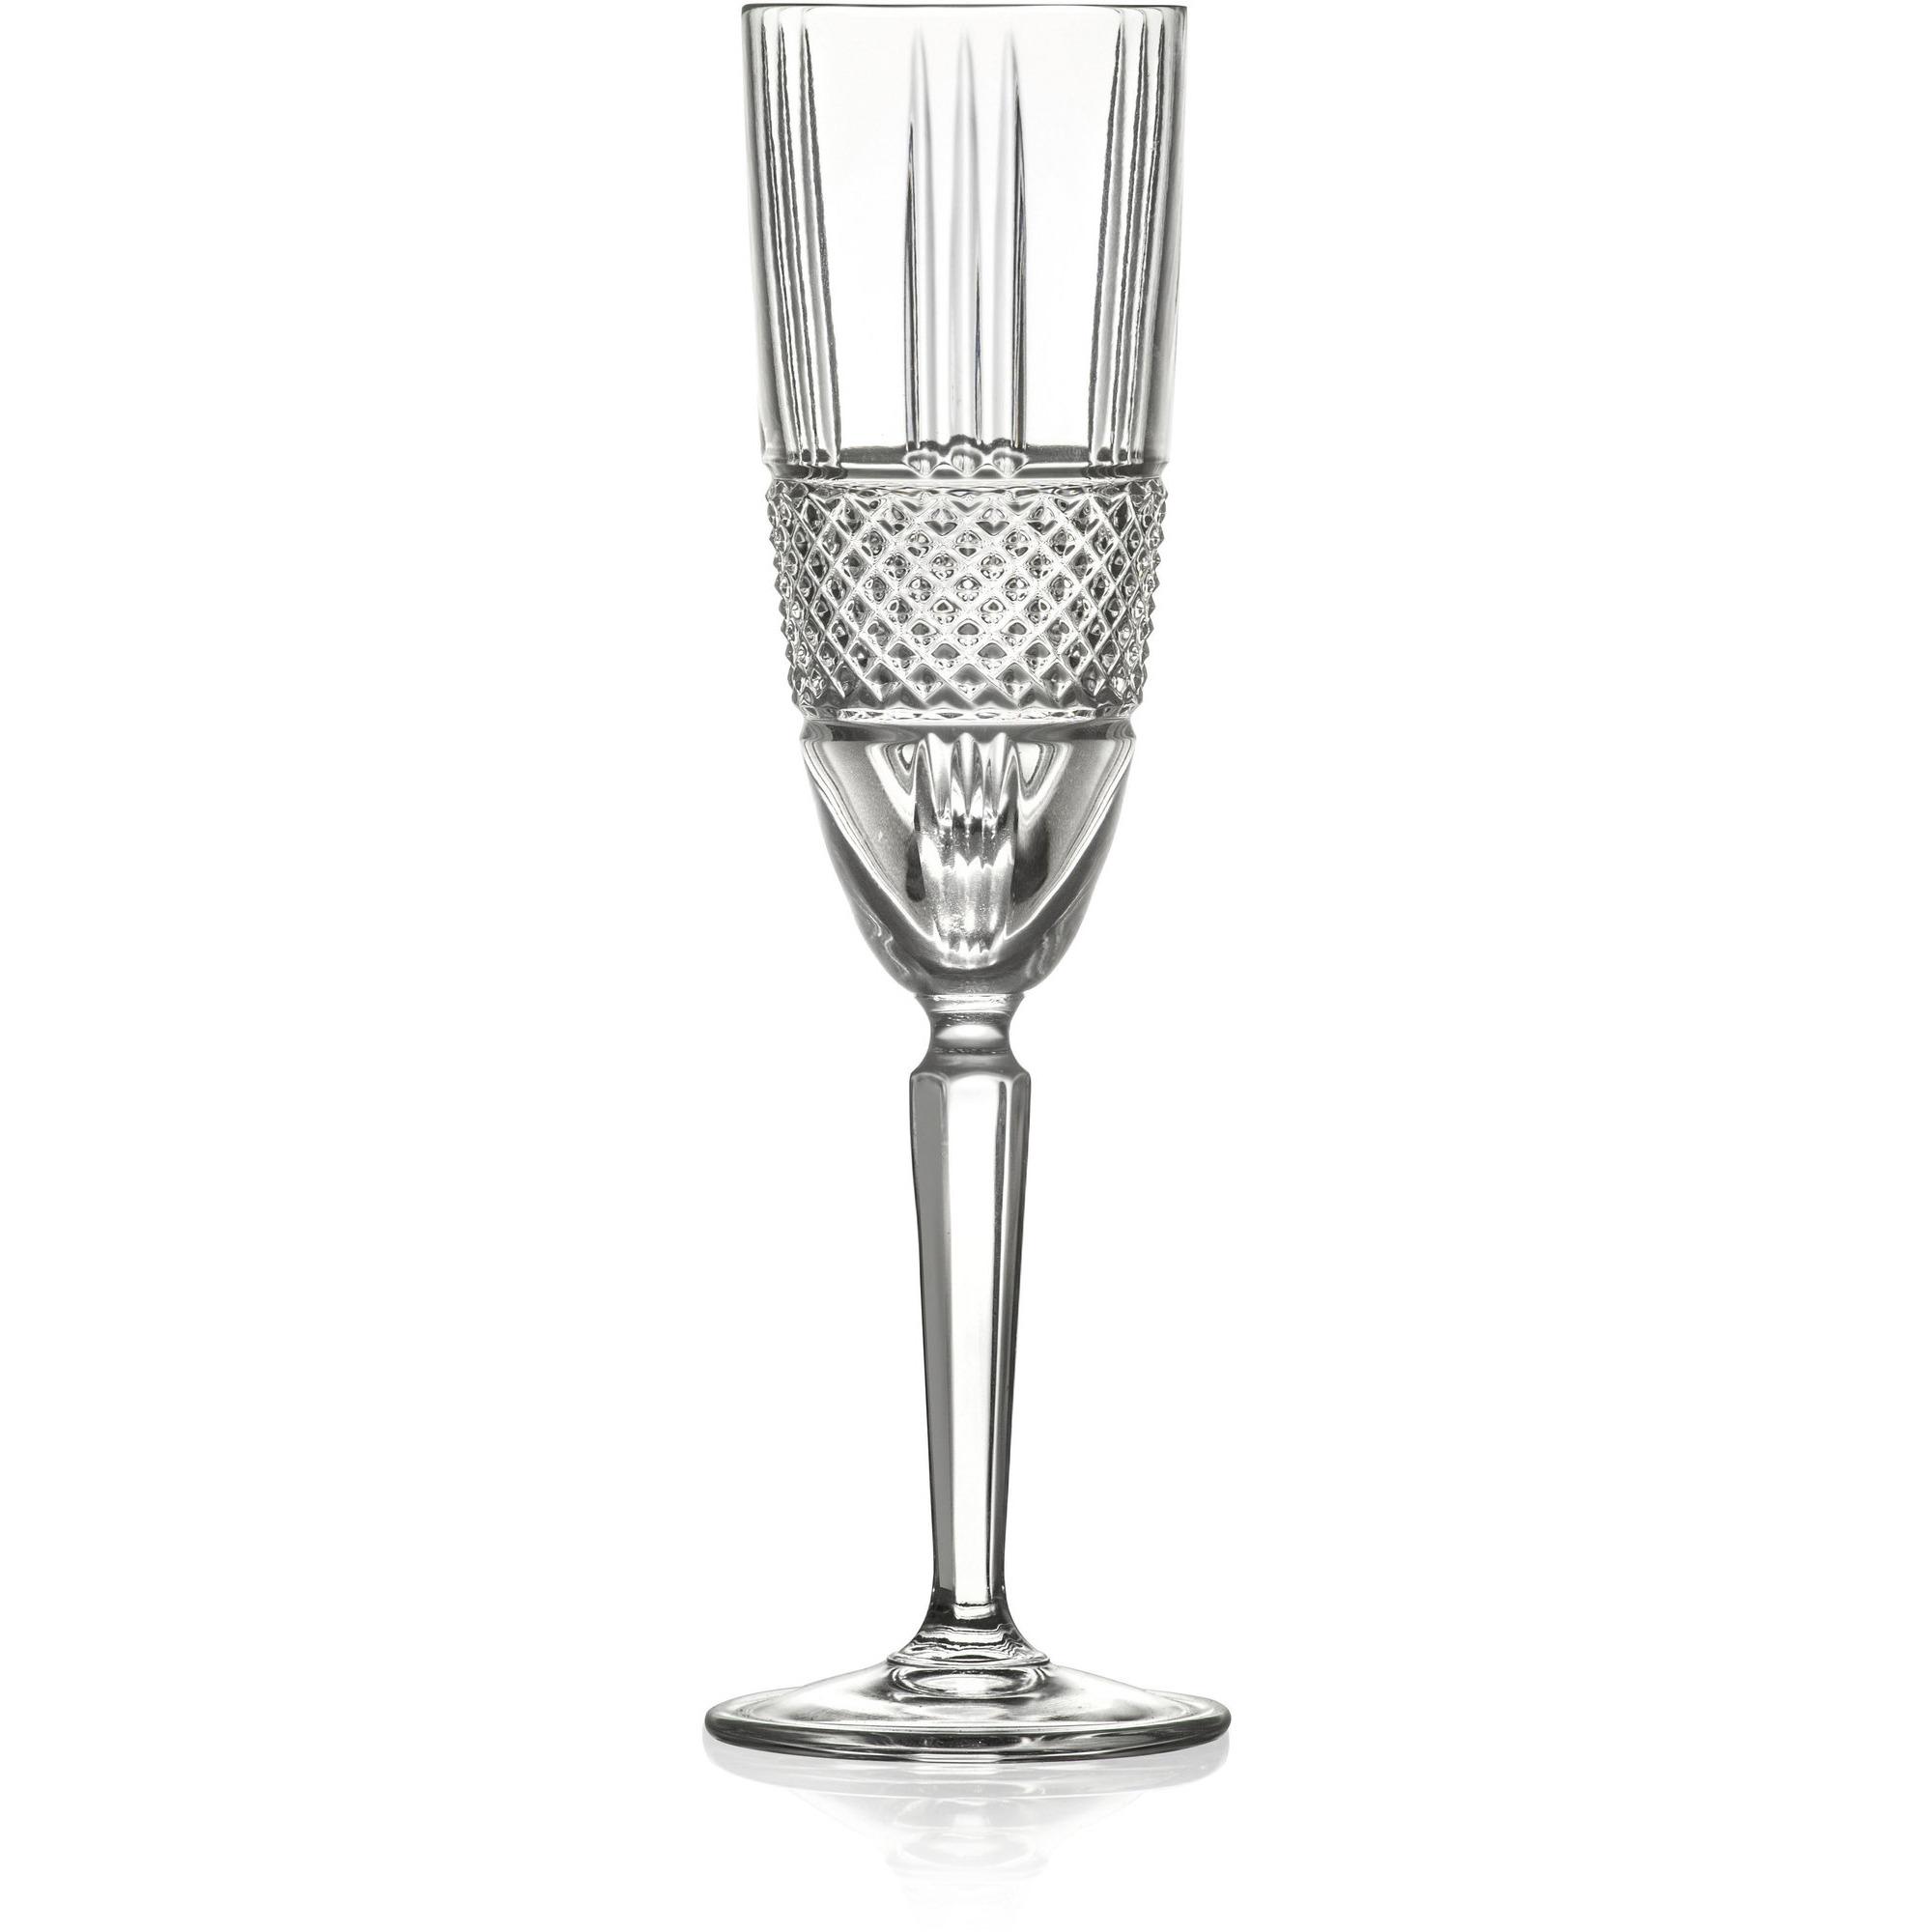 Lyngby Glas Brilliante Champagneglas 4 st